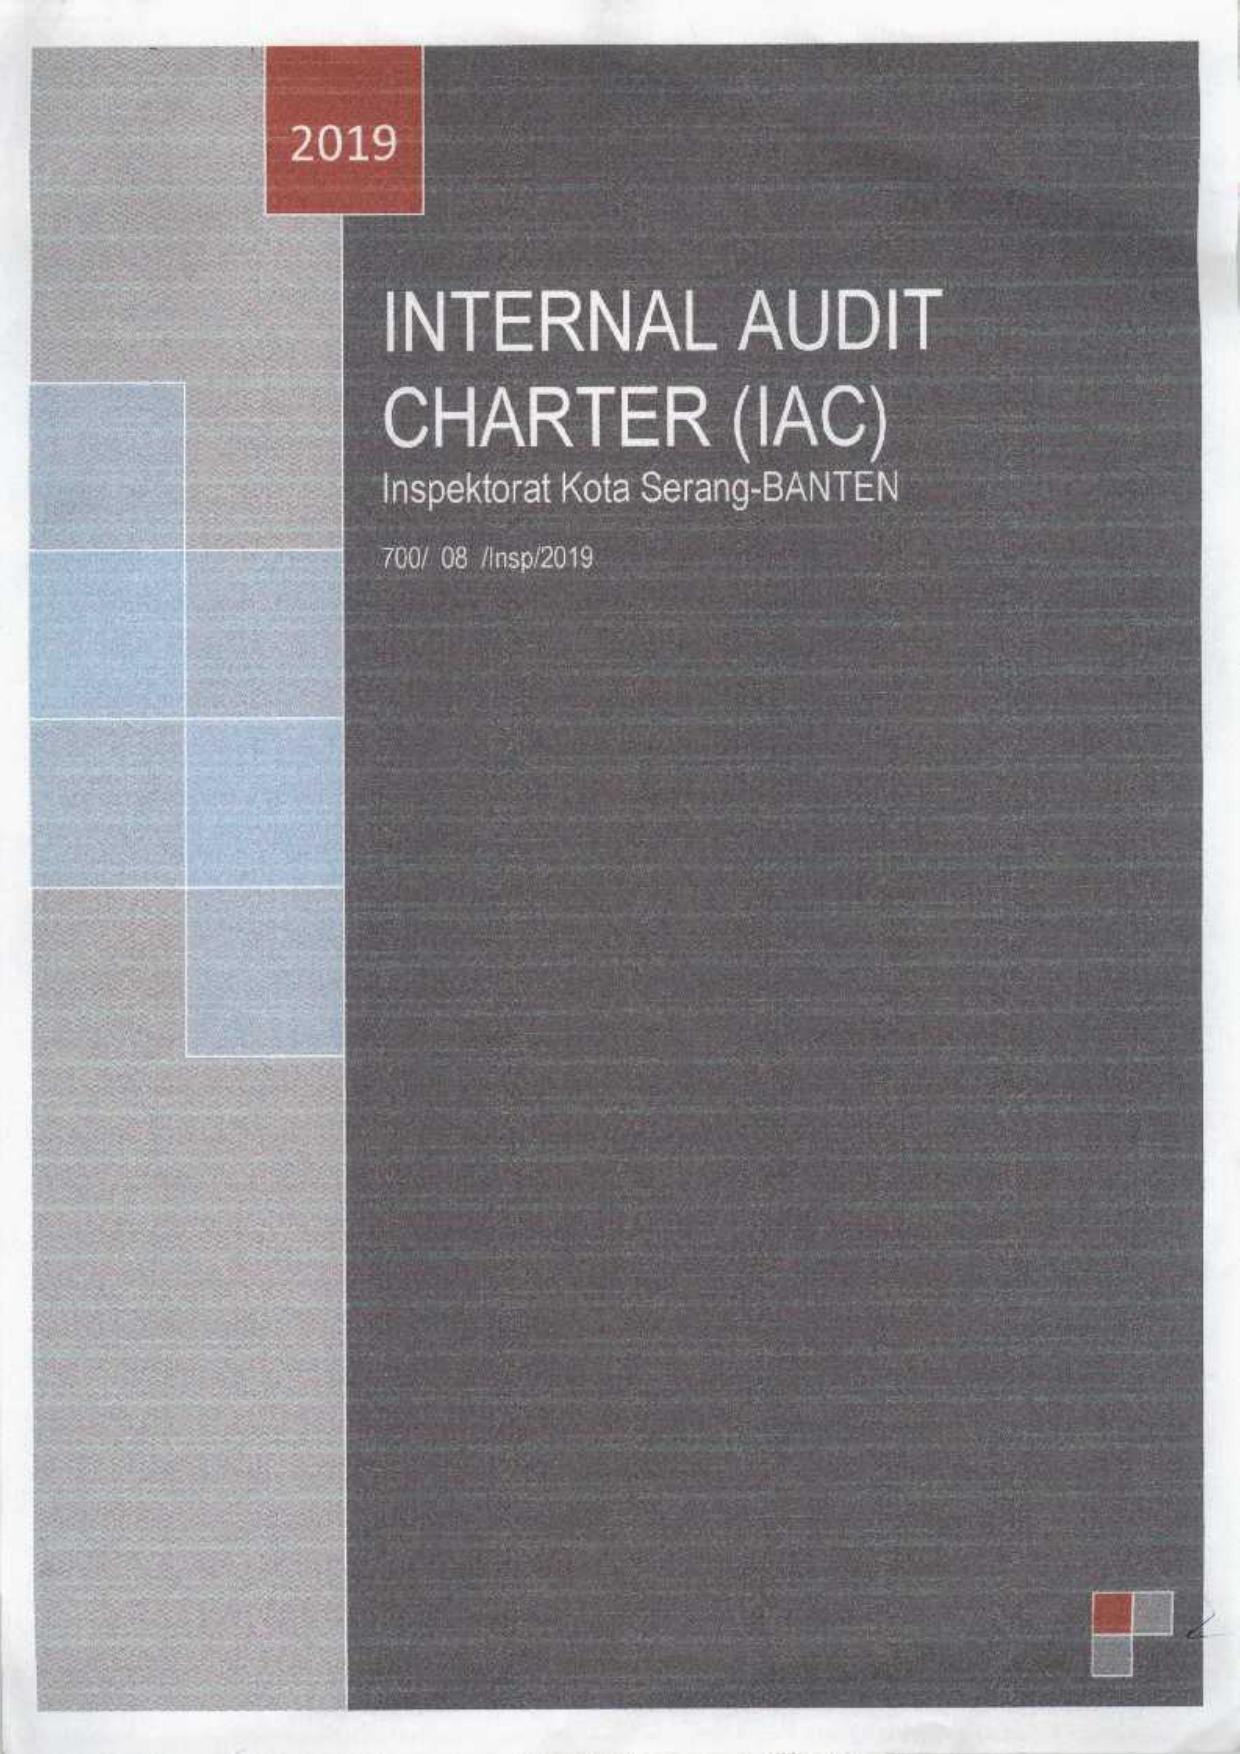 Sosialisai Internal Audit Charter IAC Inspektorat Kota Serang